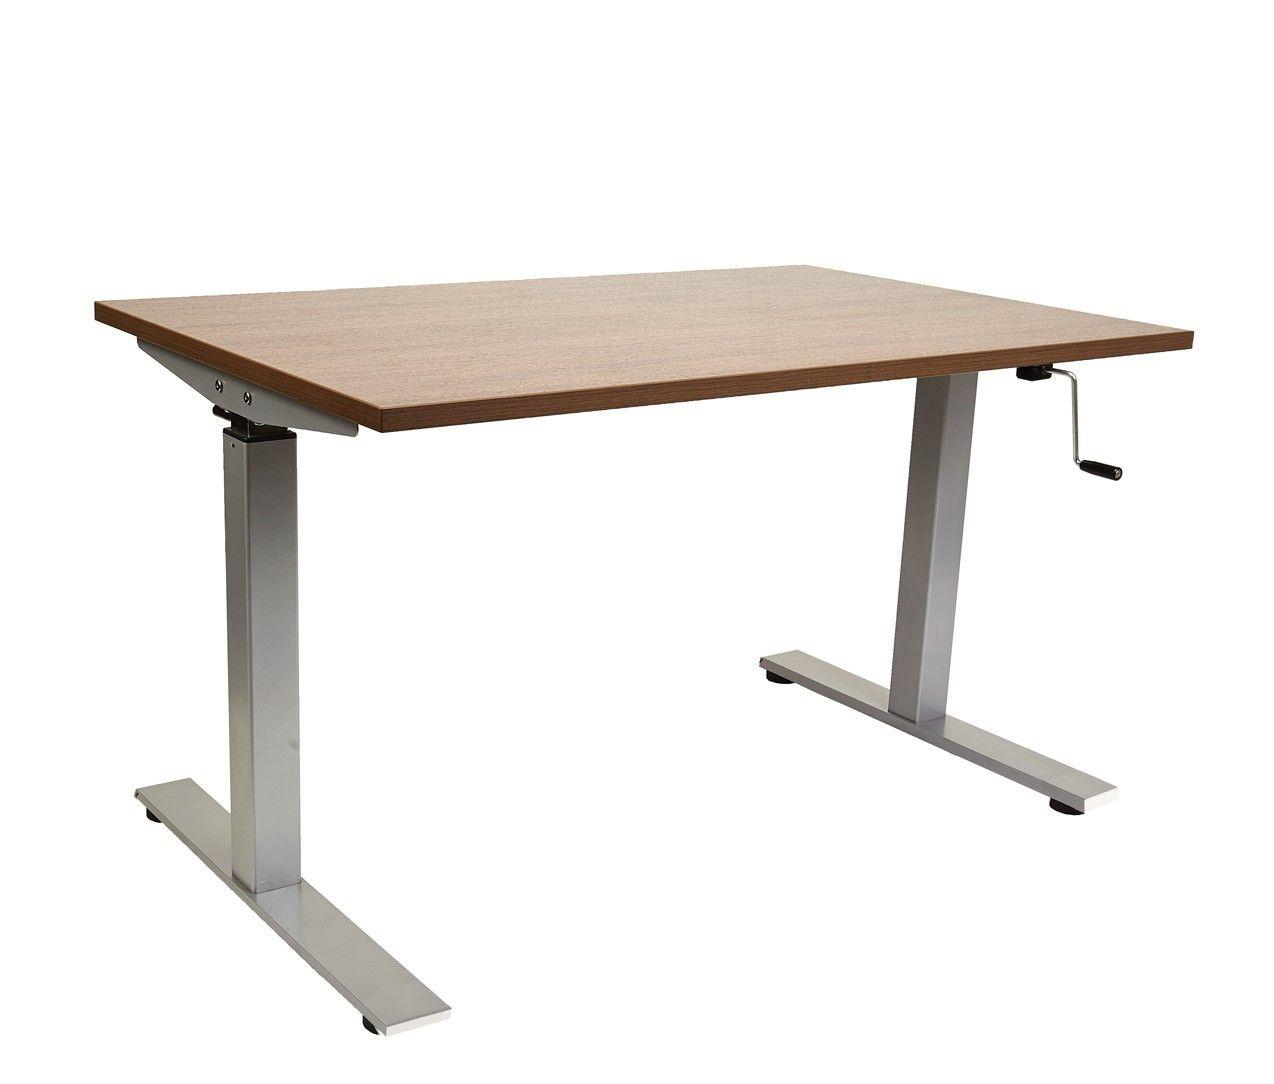 Table Avec Reglage A Manivelle Pltcrkb60nf Table Home Decor Folding Table